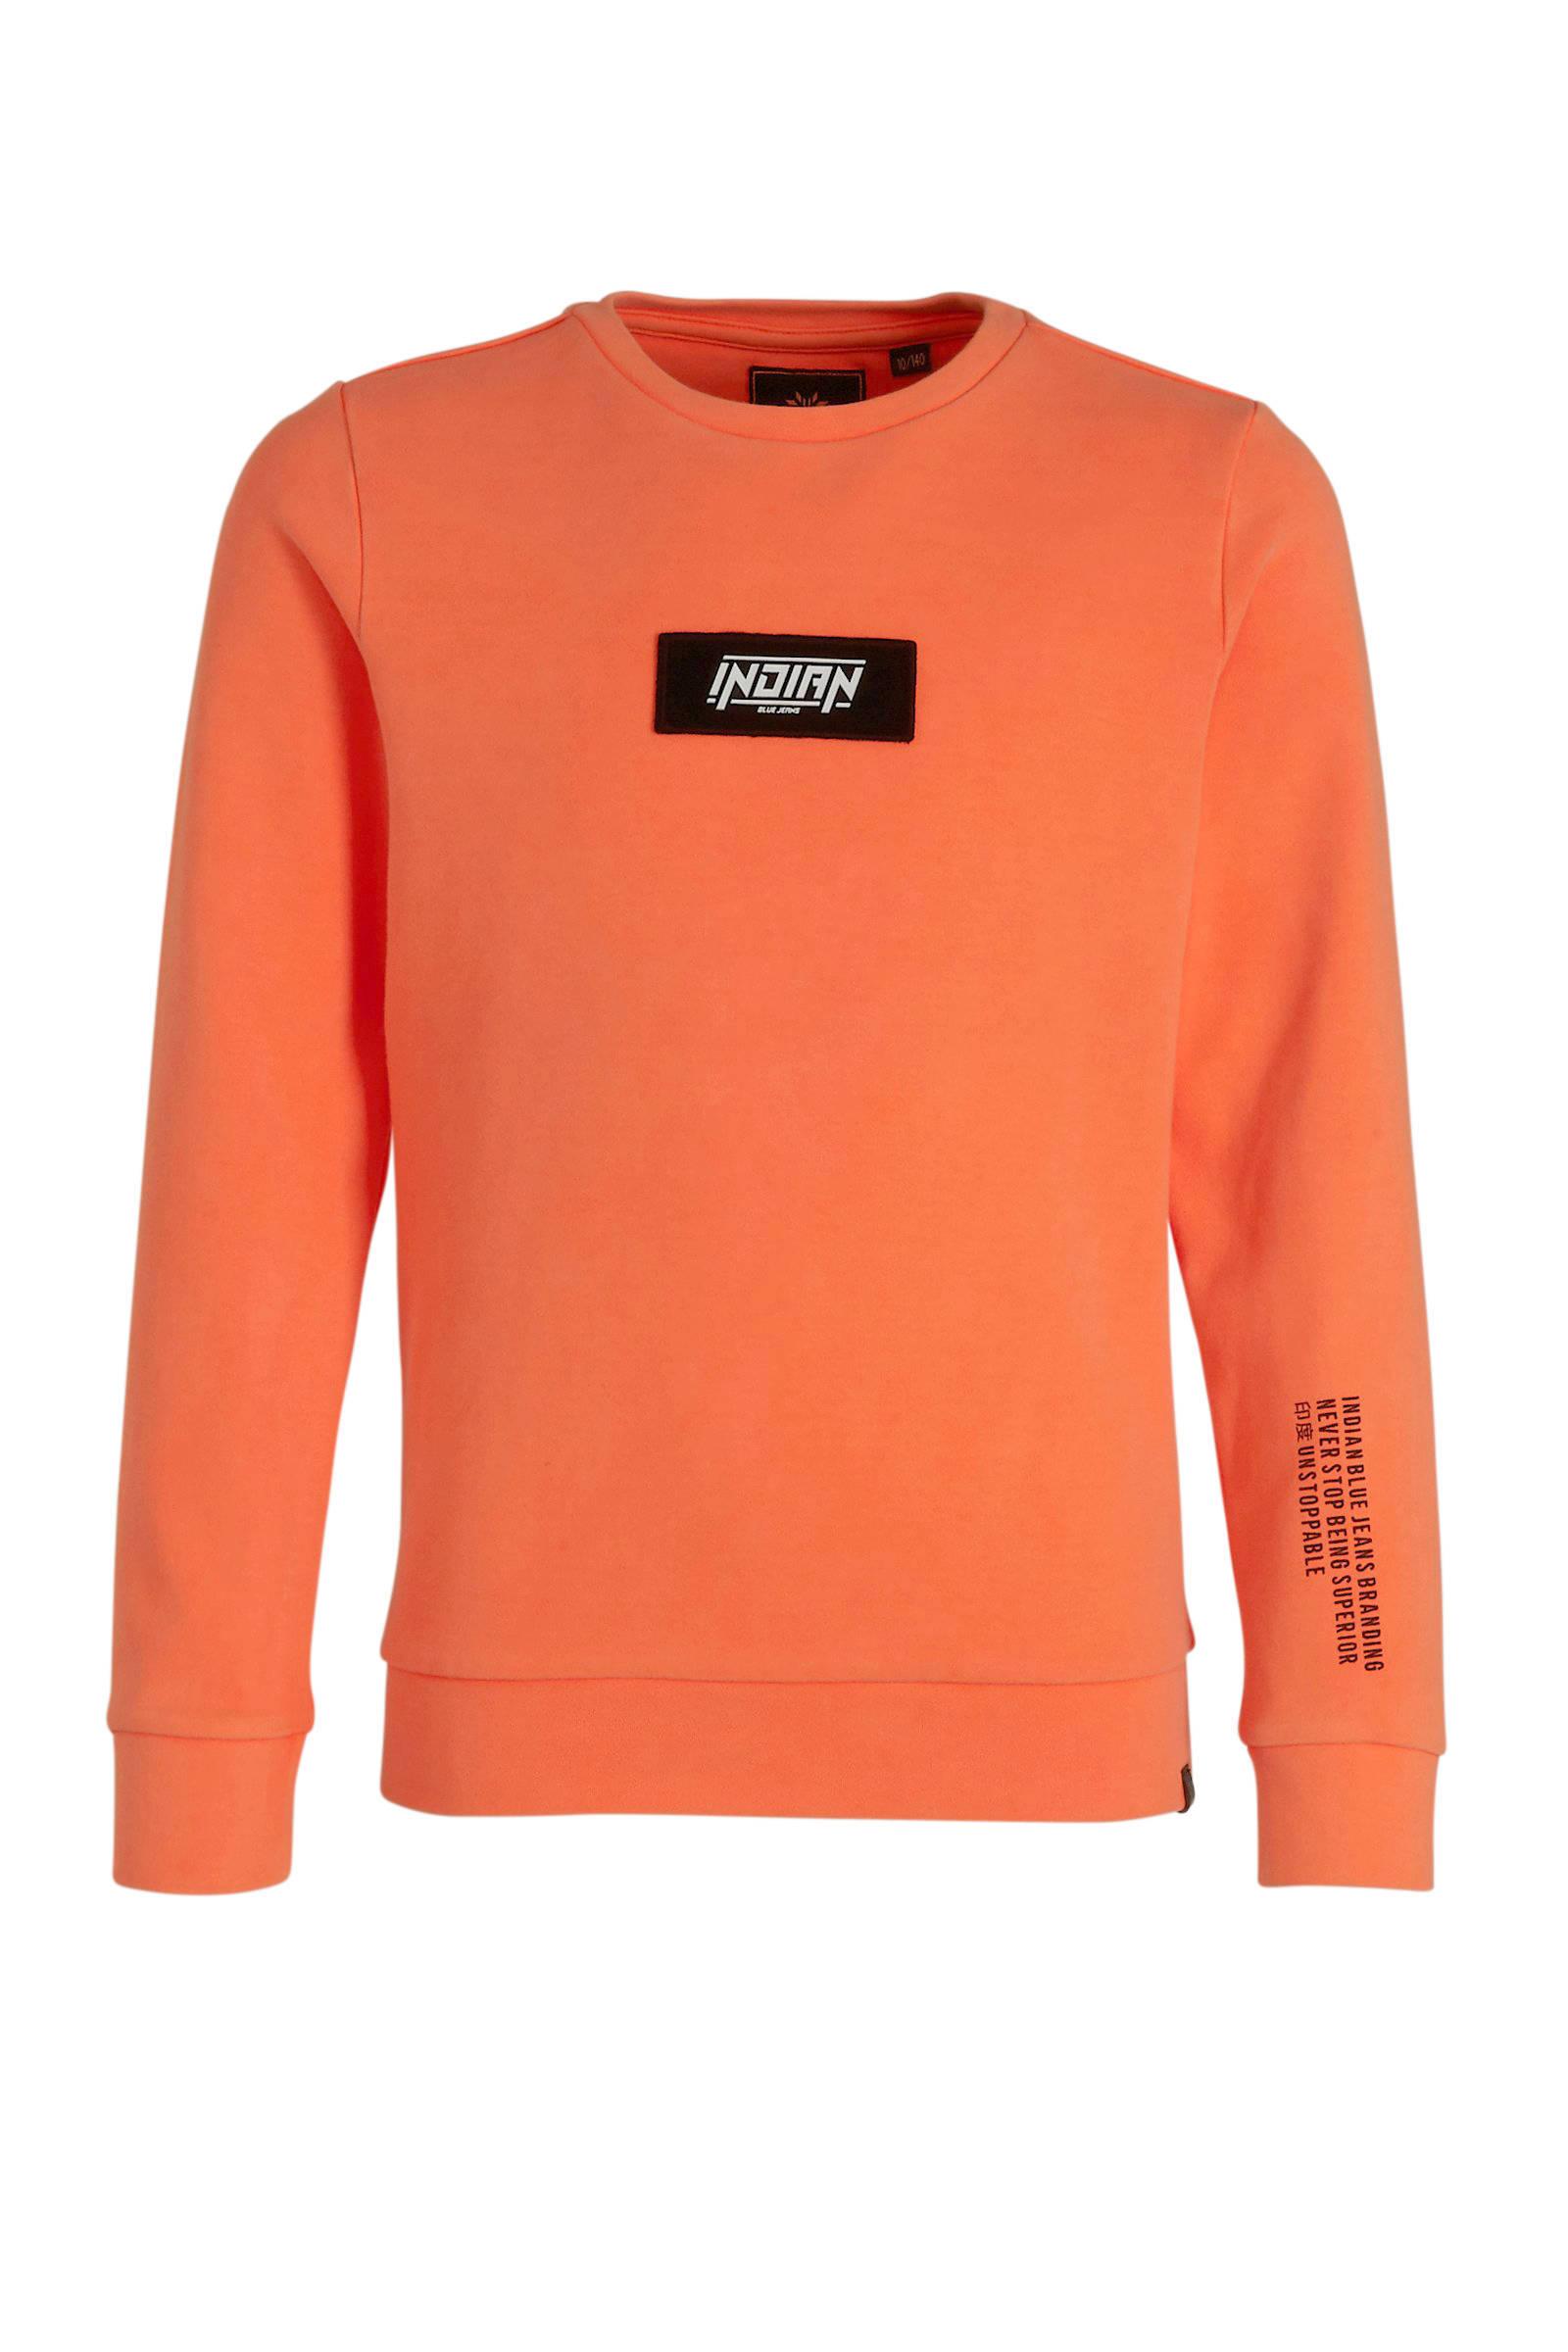 Indian Blue Jeans sweater met logo oranje | wehkamp